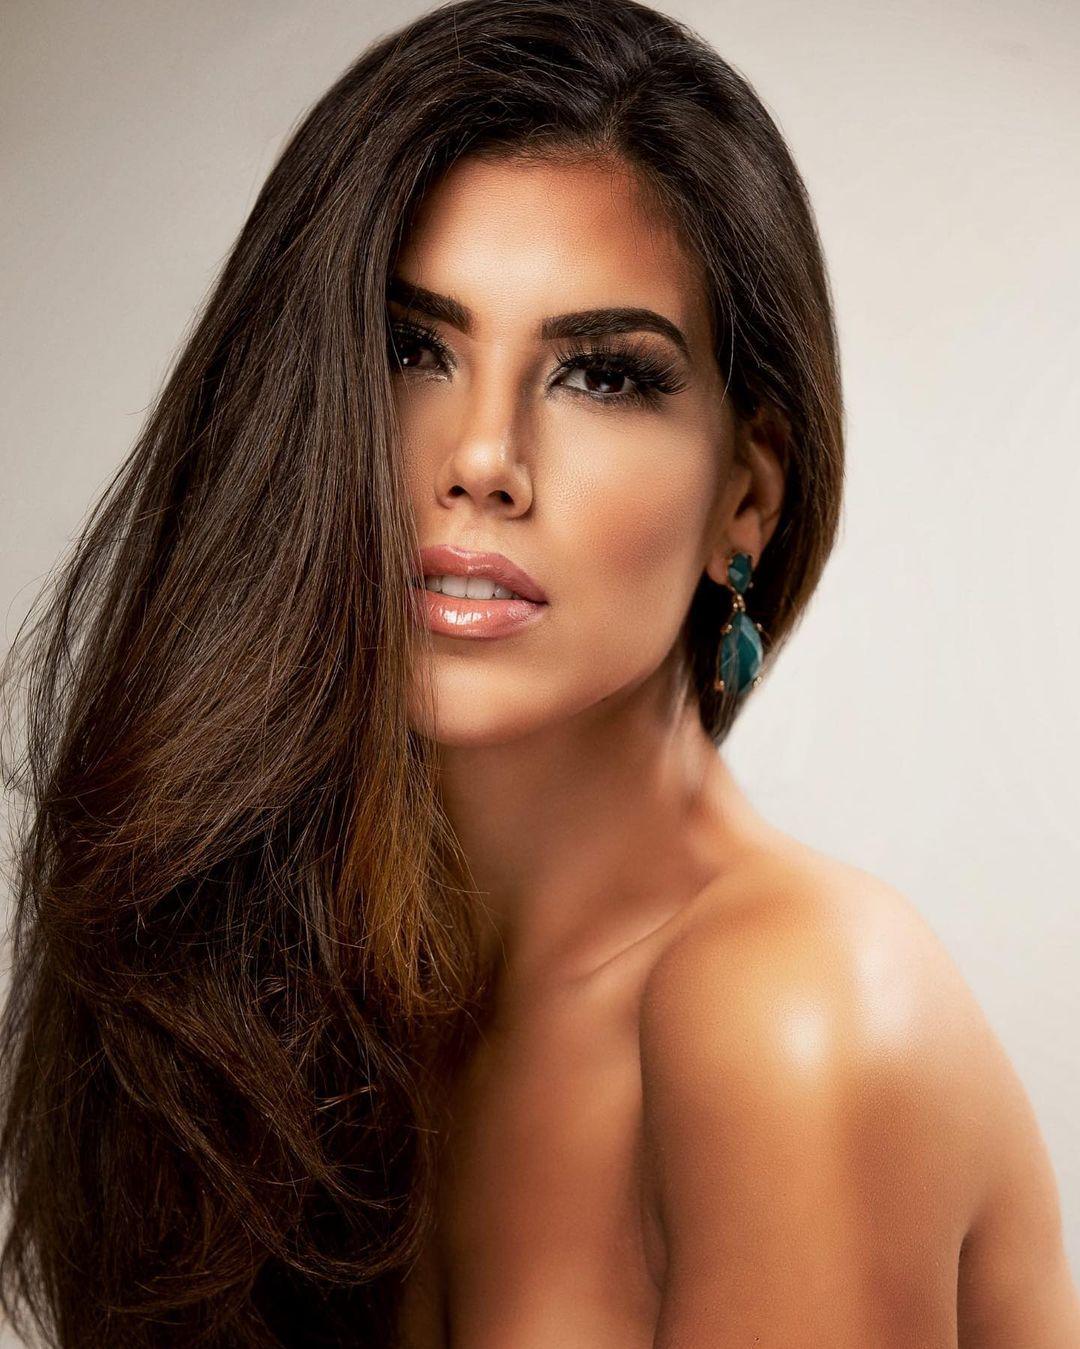 sofia del prado, top 10 de miss universe 2017/reyna hispanoamericana 2015/miss charm spain 2021. - Página 14 Missun17